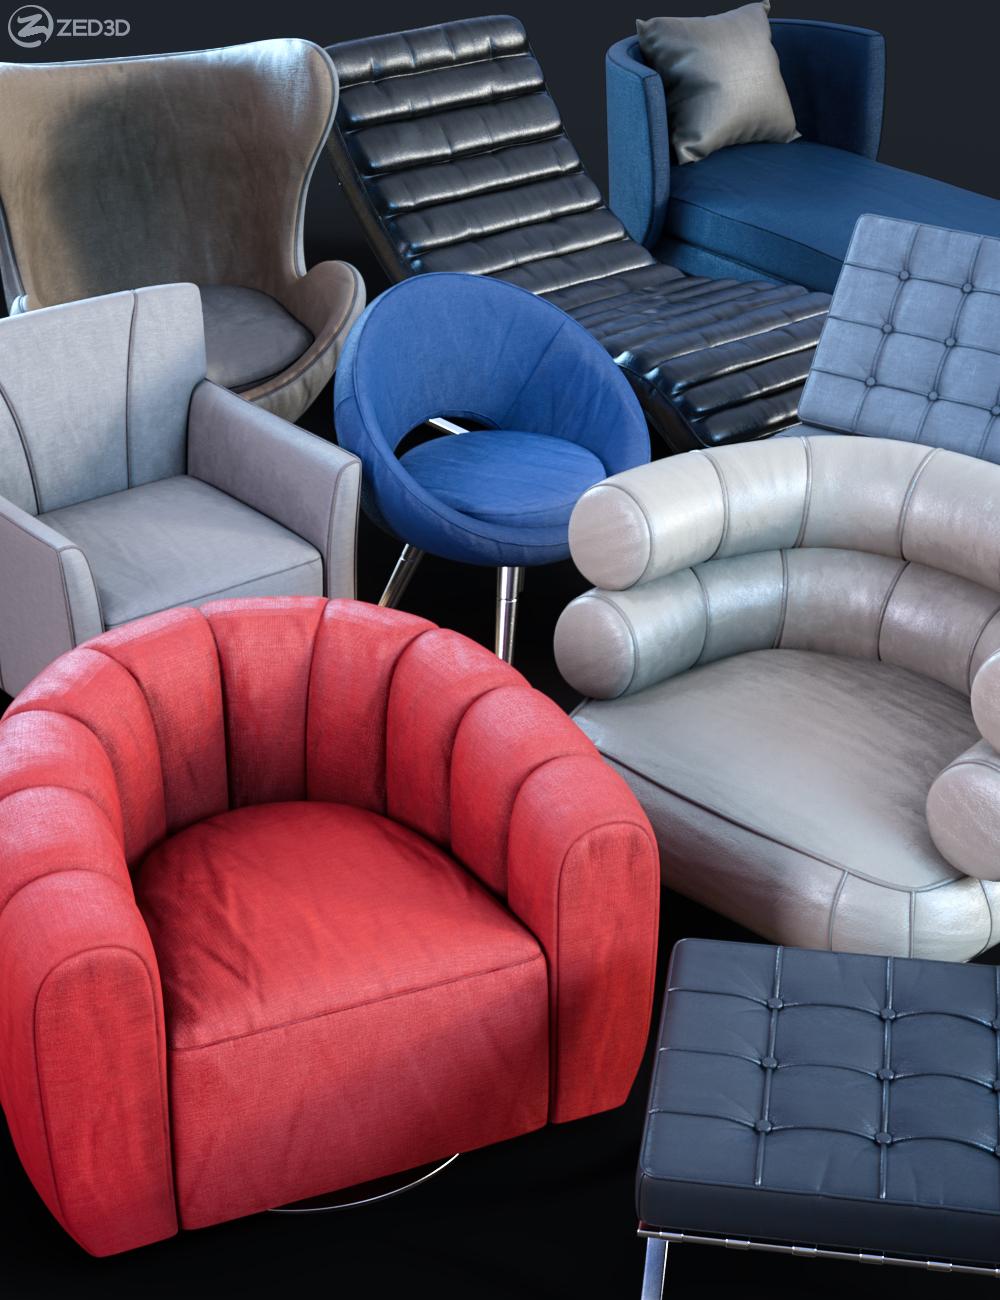 Z Modern Seating Scene Essentials by: Zeddicuss, 3D Models by Daz 3D